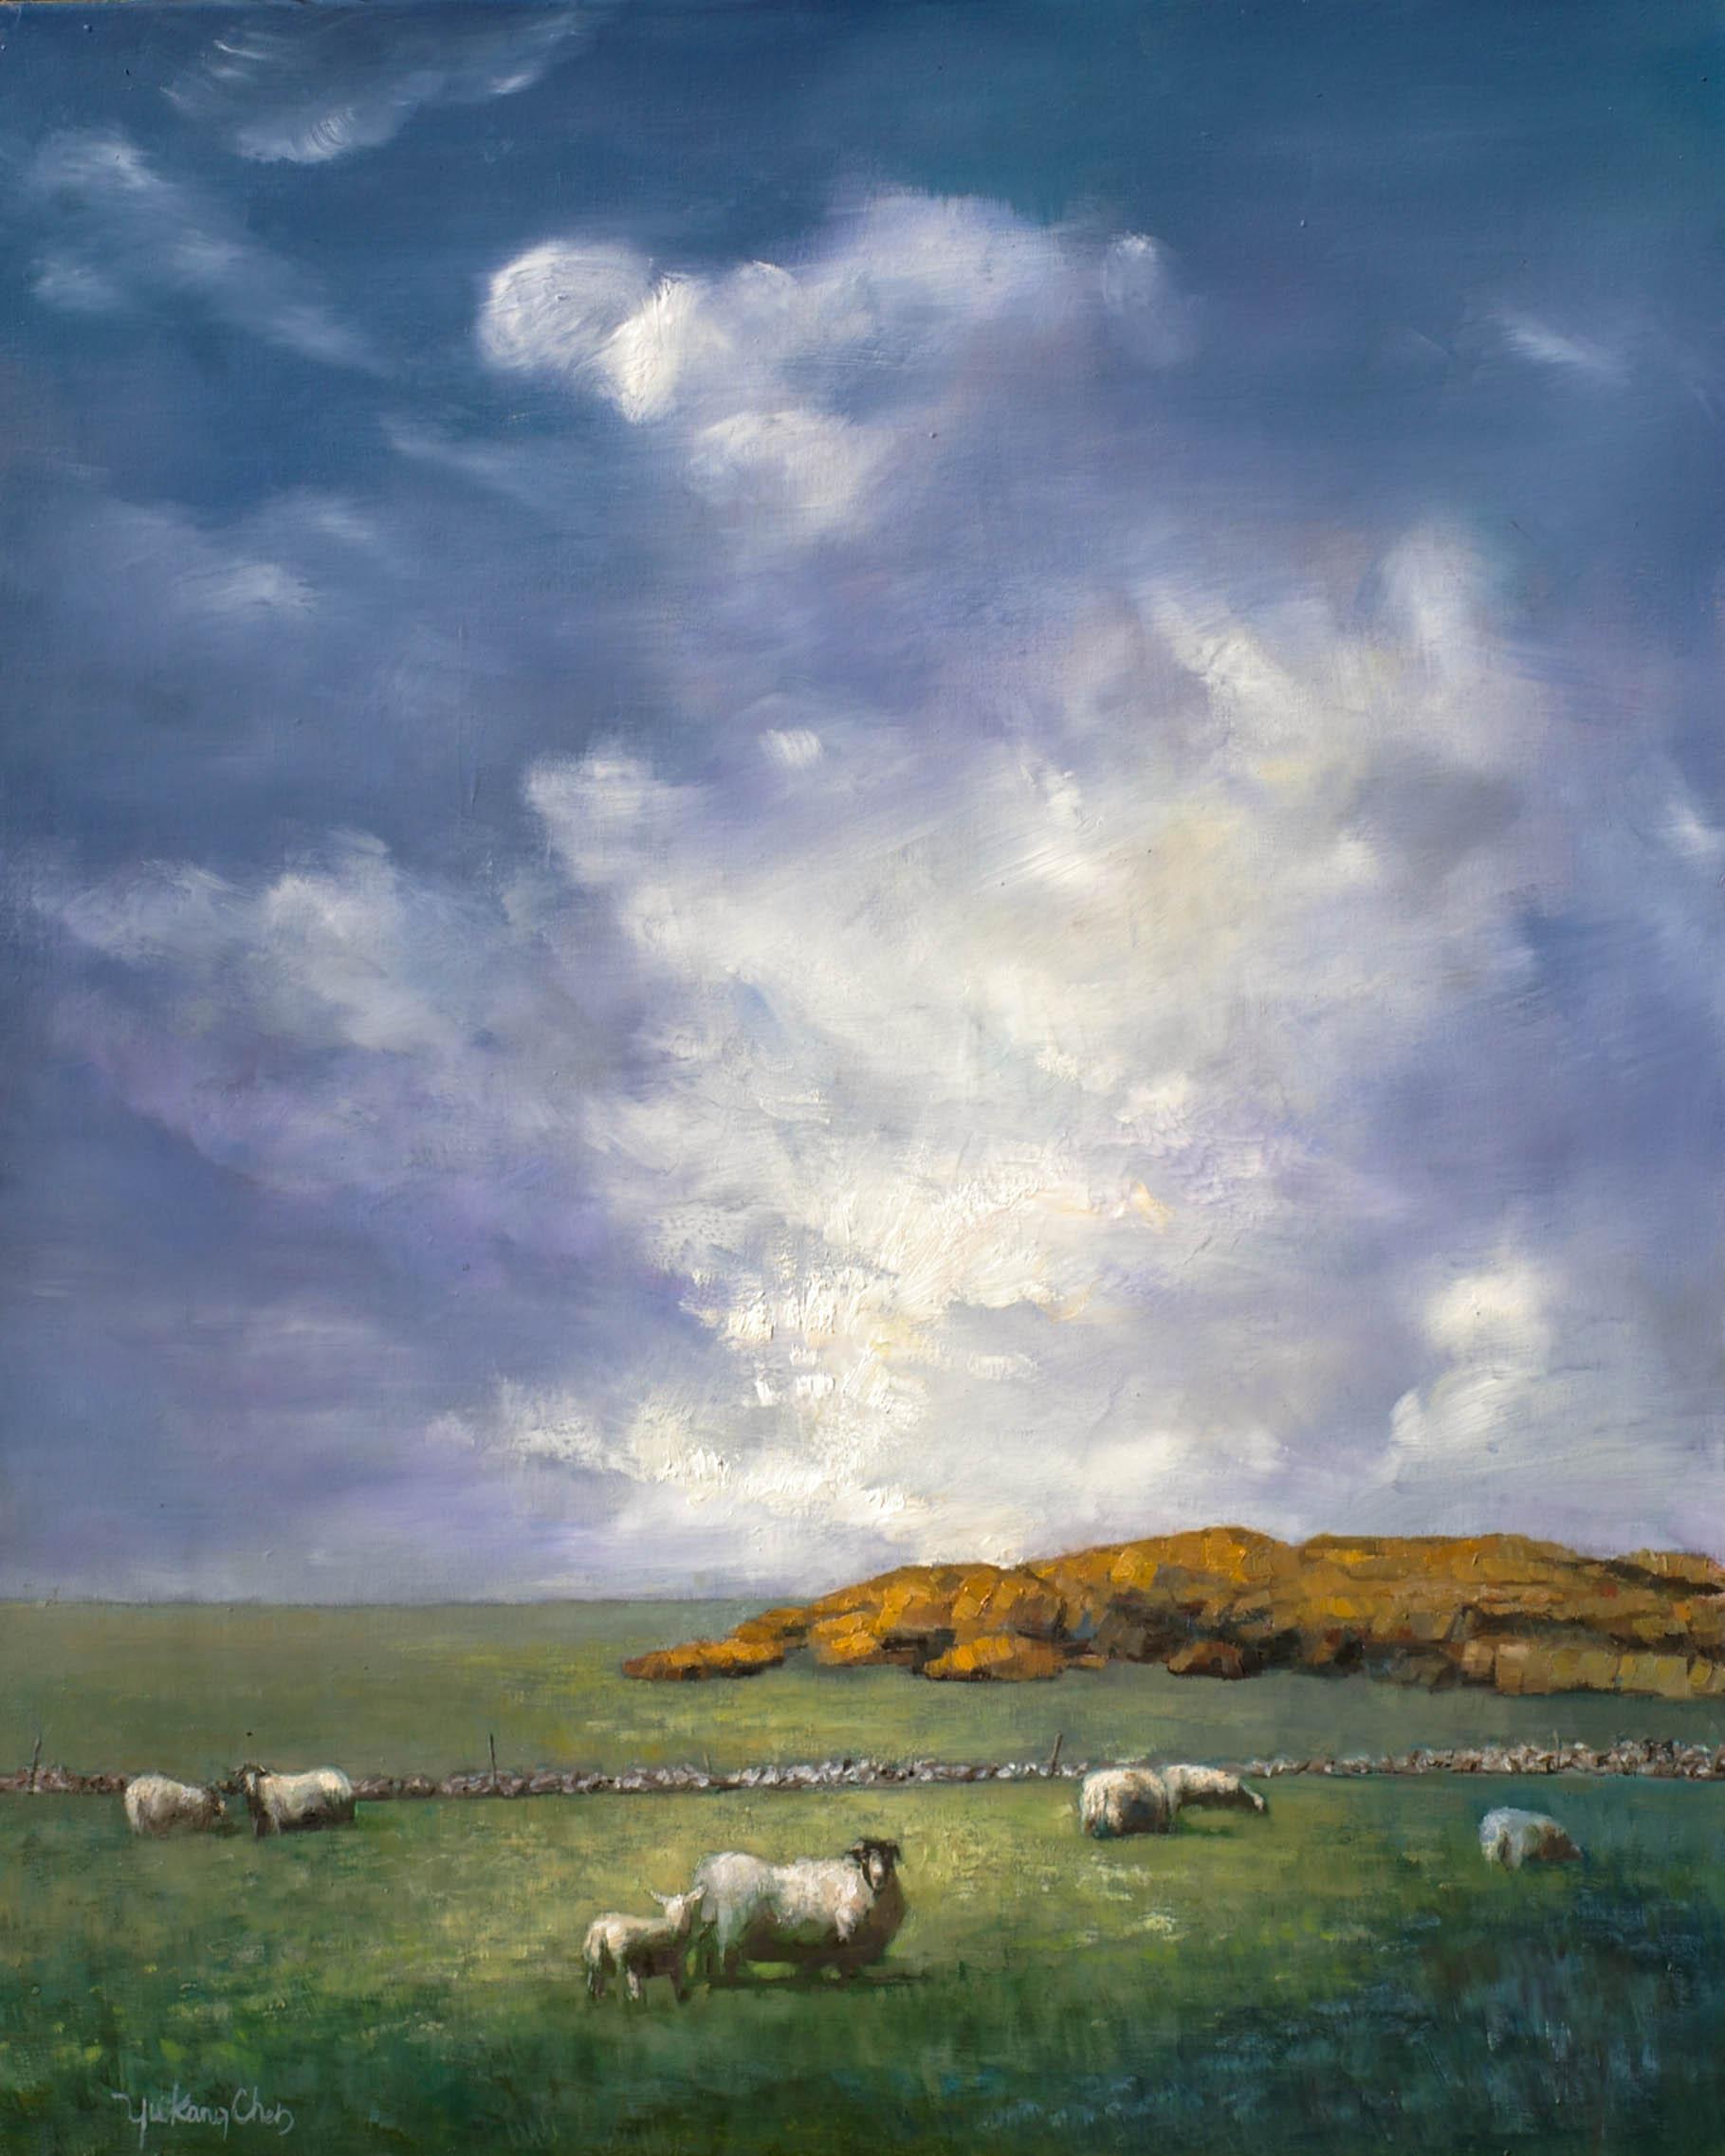 White Clouds (Galway, Ireland)